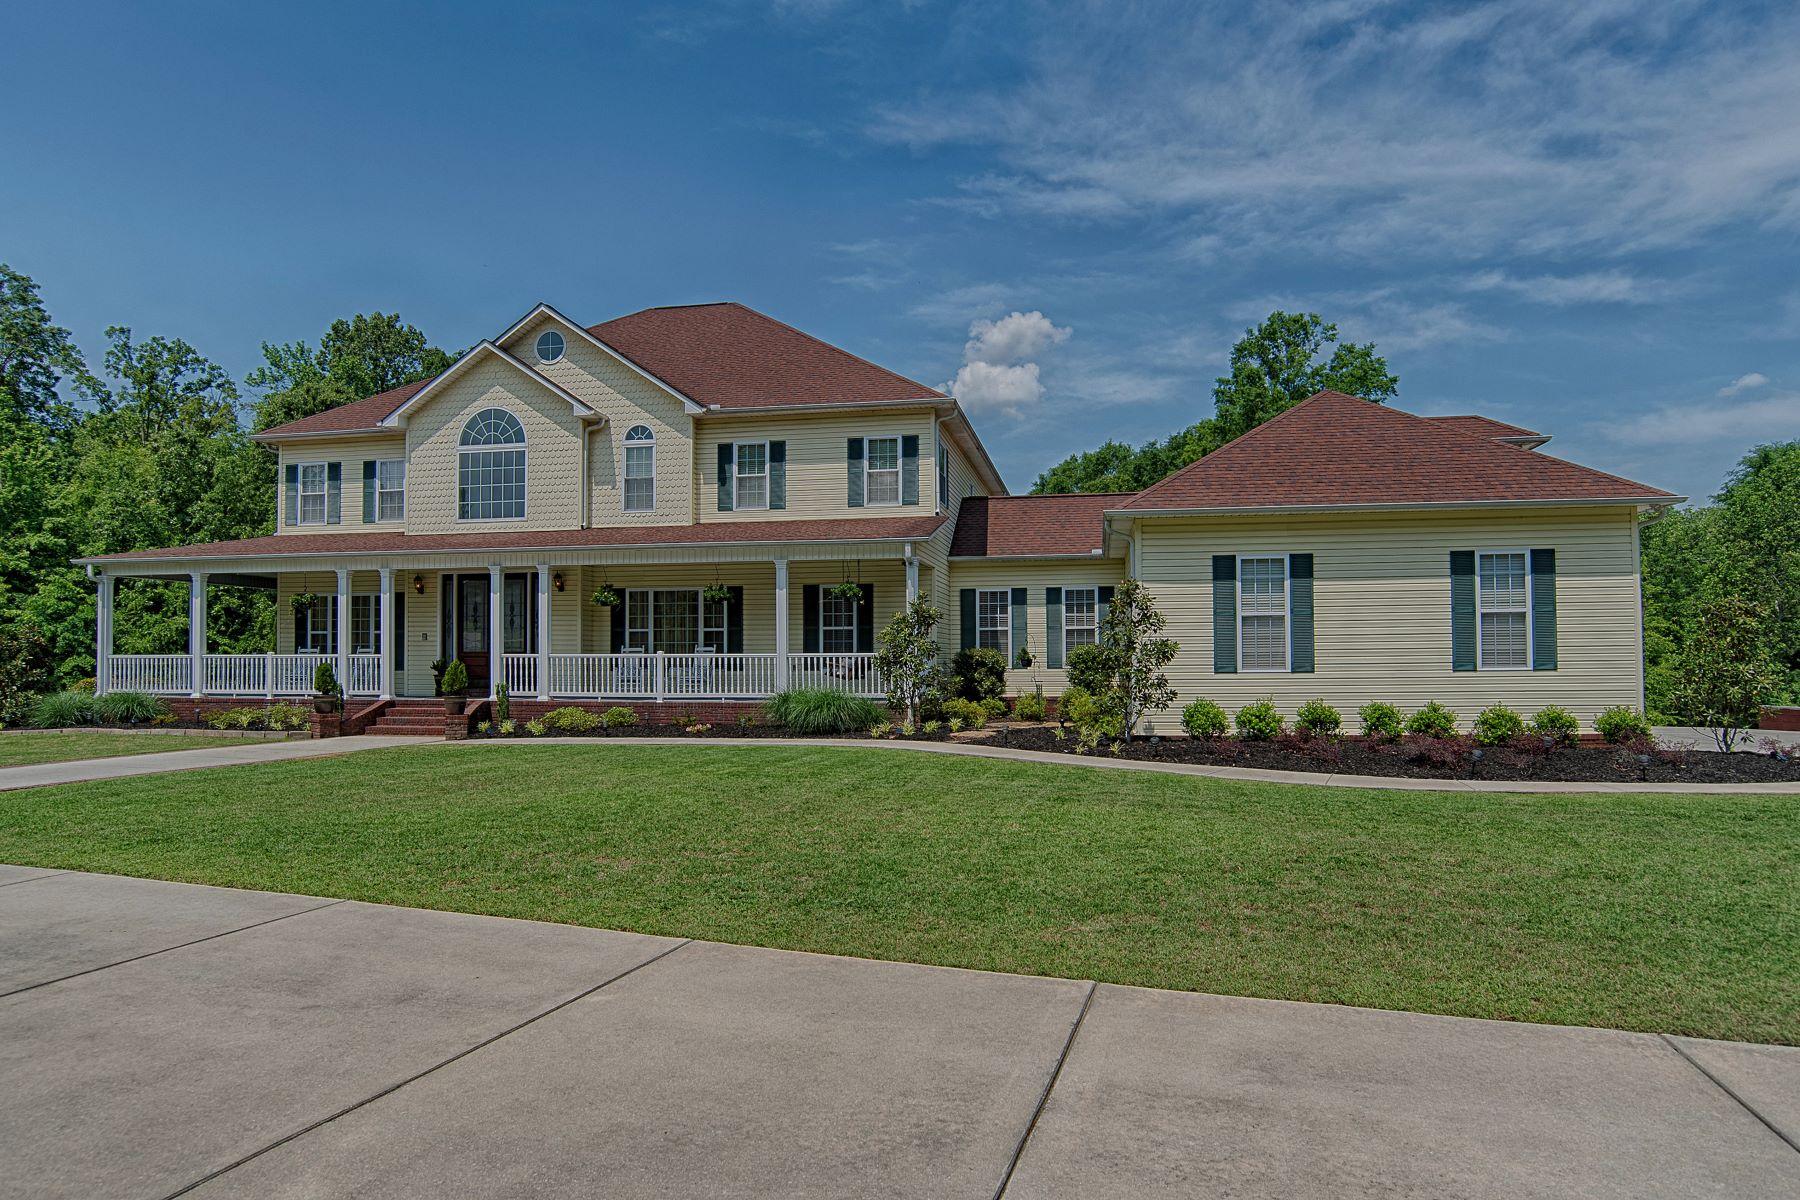 Single Family Homes for Active at 1200 Windsong Circle Hartselle, Alabama 35640 United States